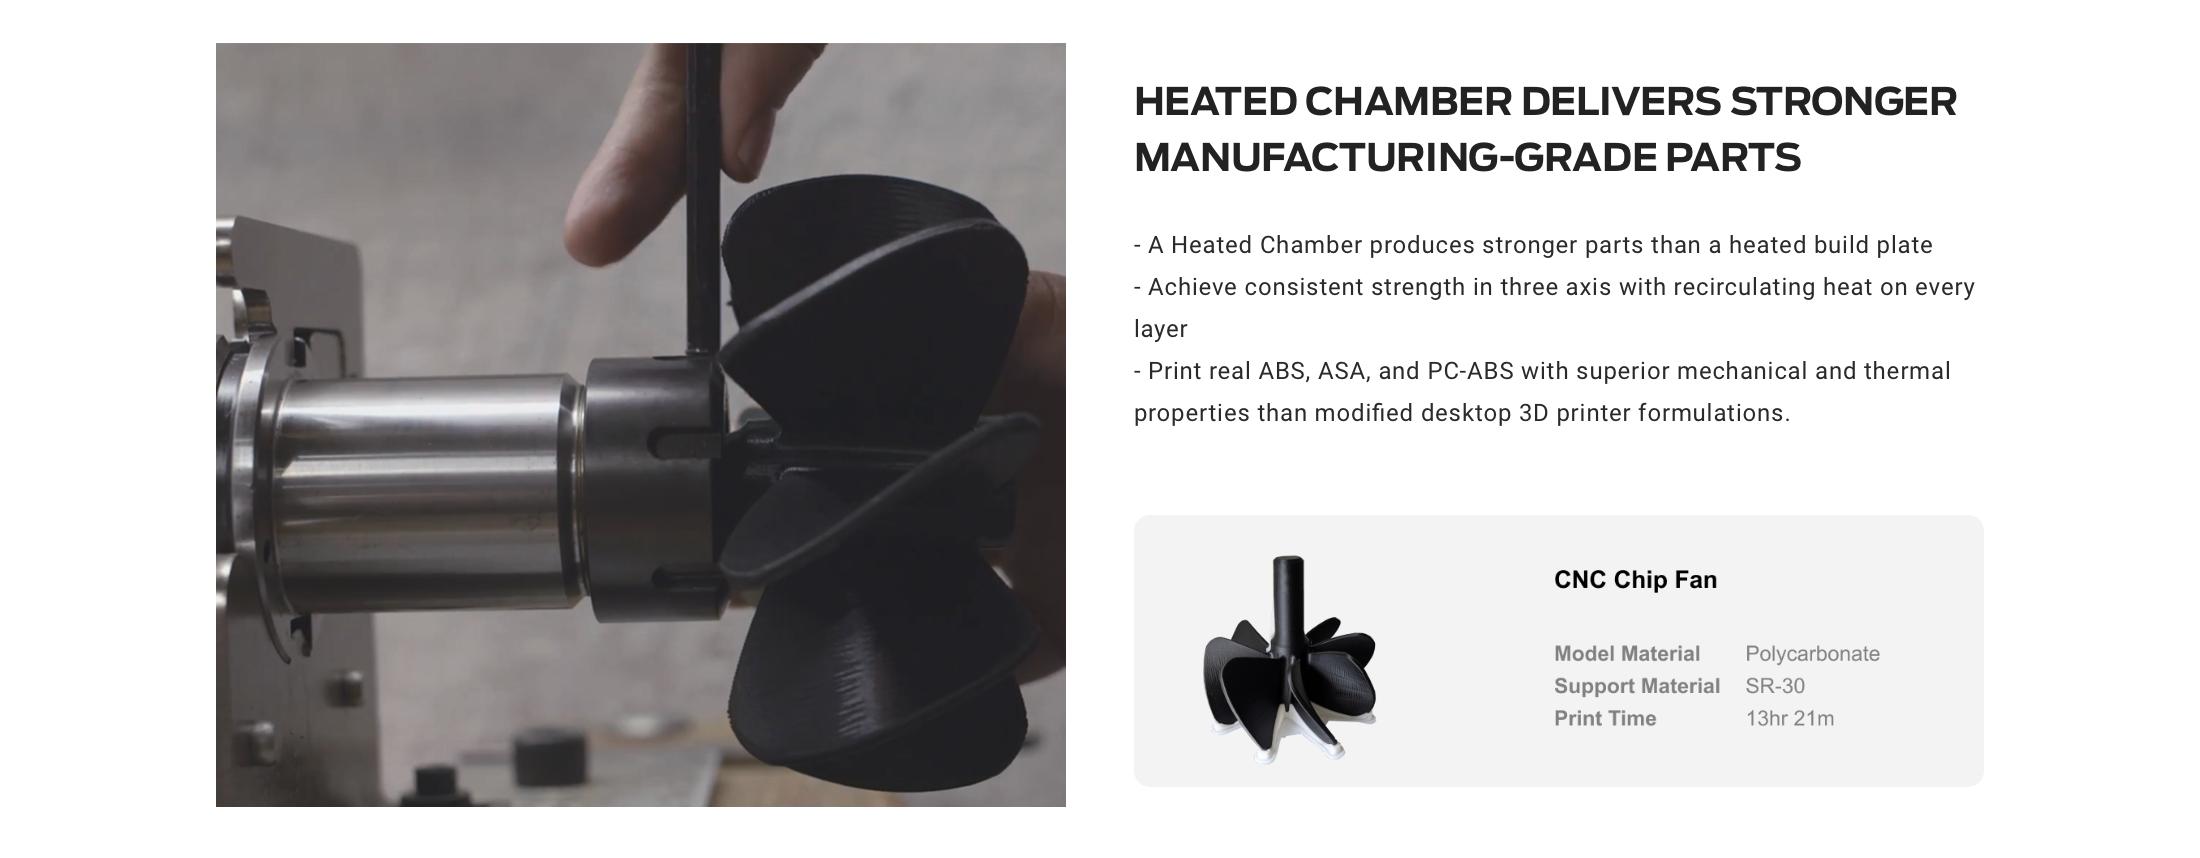 Method x heated chamber